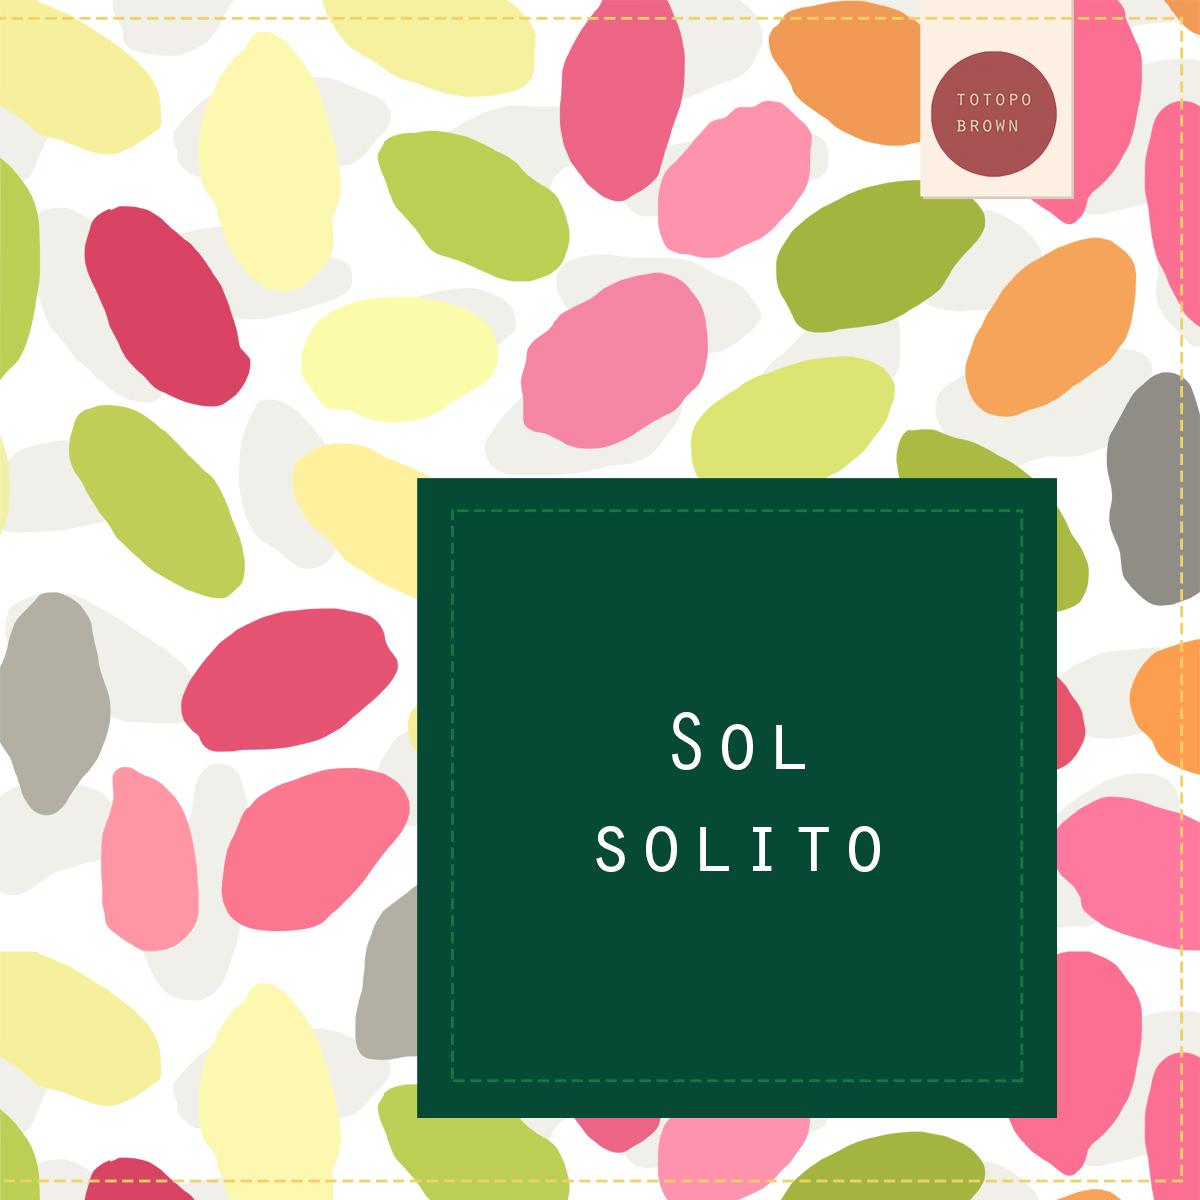 Libro Sol Solito - Estrella Ortiz